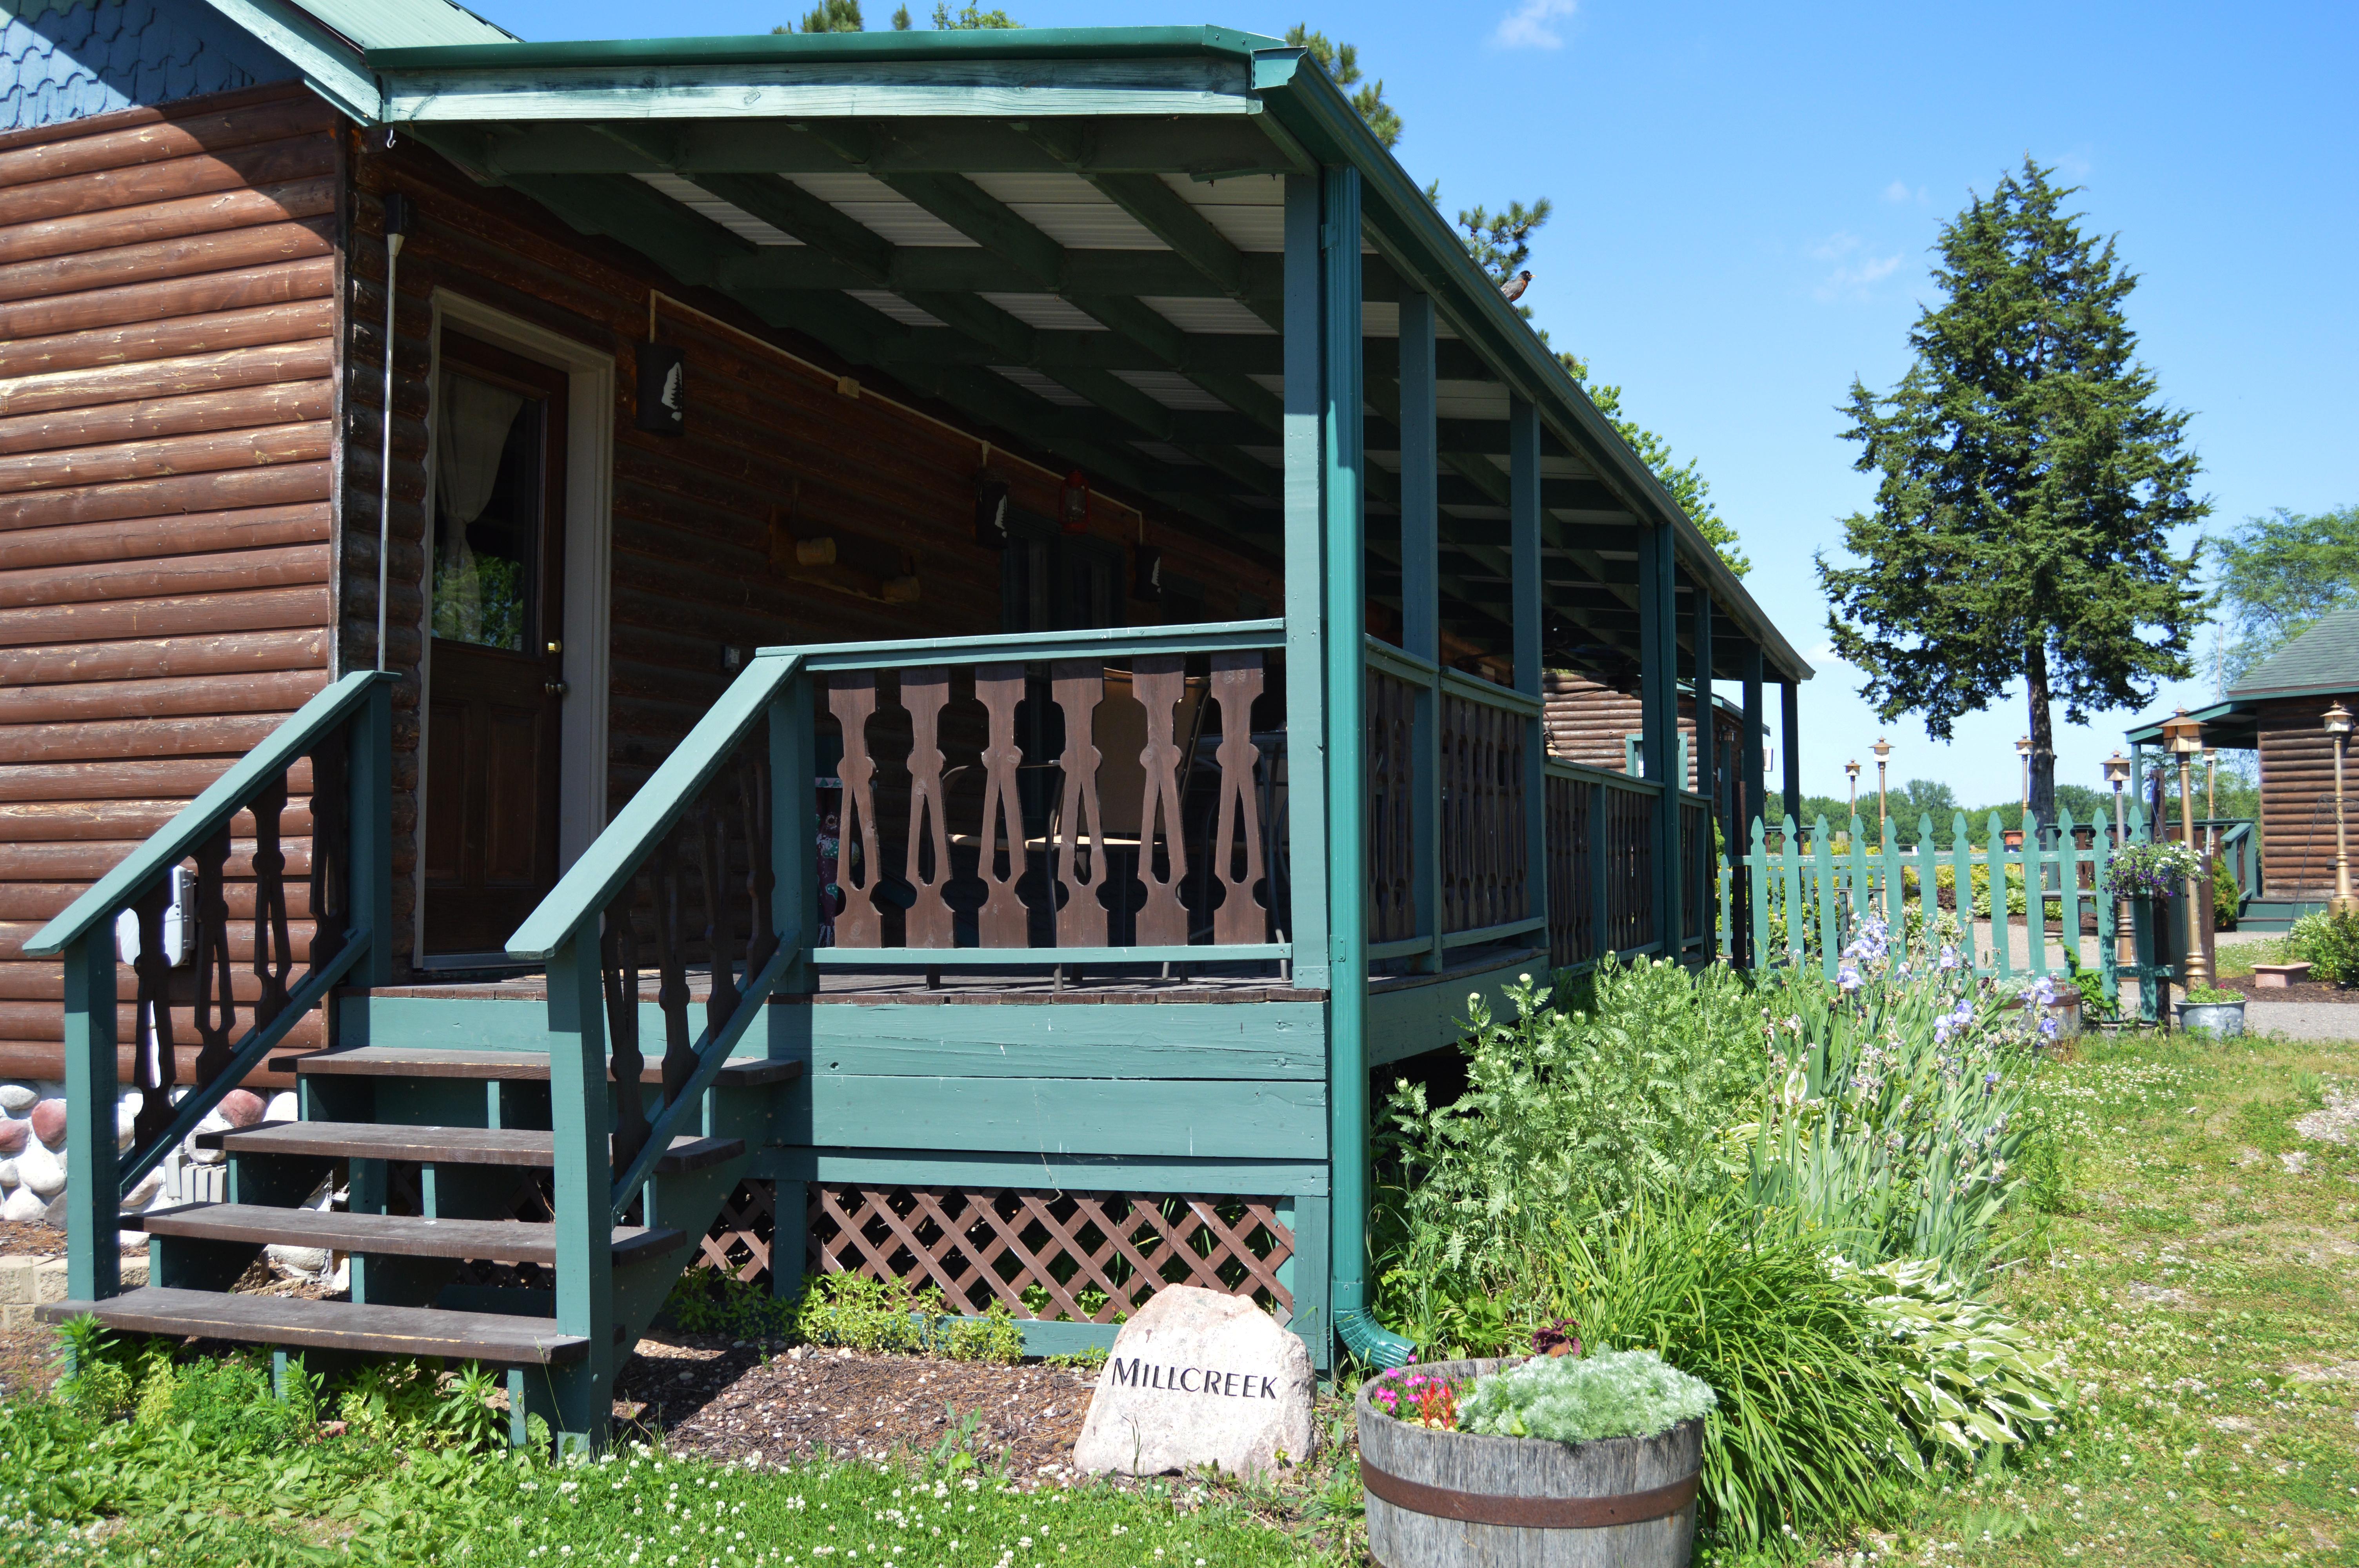 Mill Creek Cabin